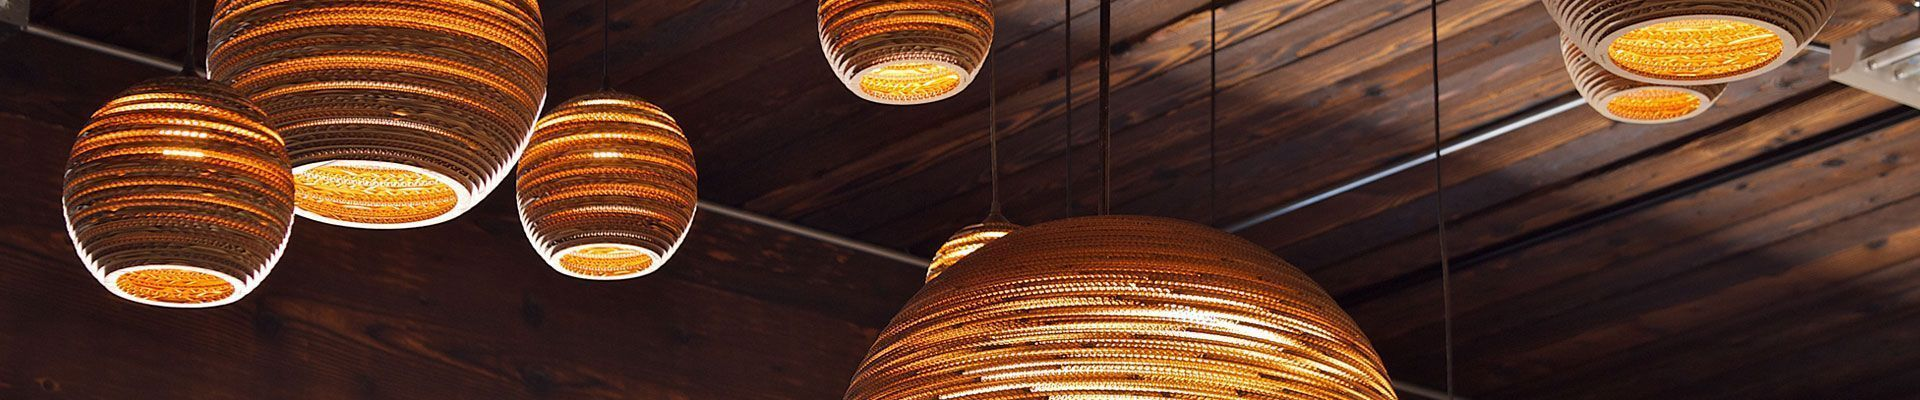 Graypants hanglampen